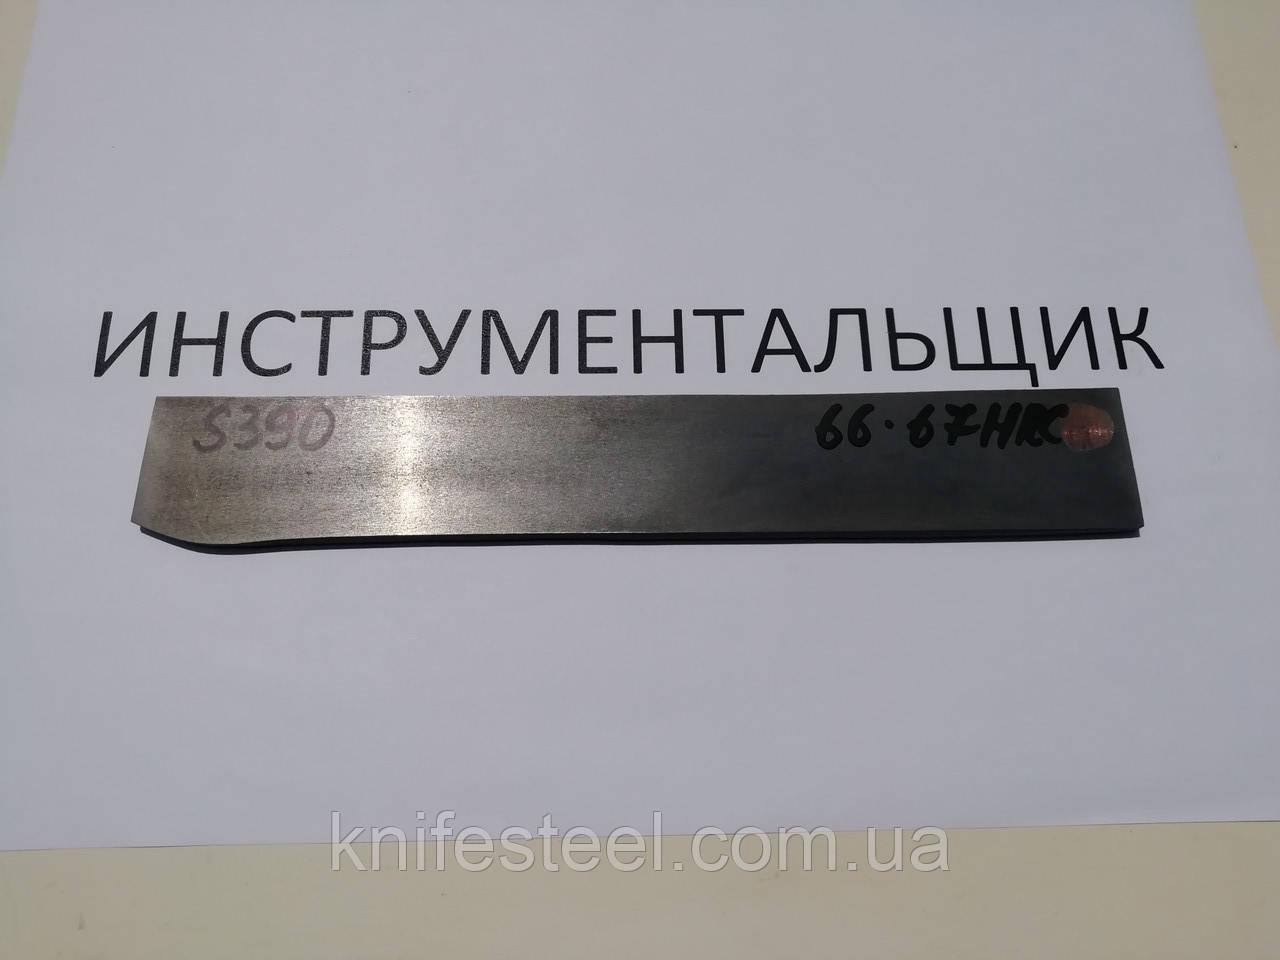 Заготовка для ножа сталь S390 220х32х4 мм термообработка (66-67 HRC)